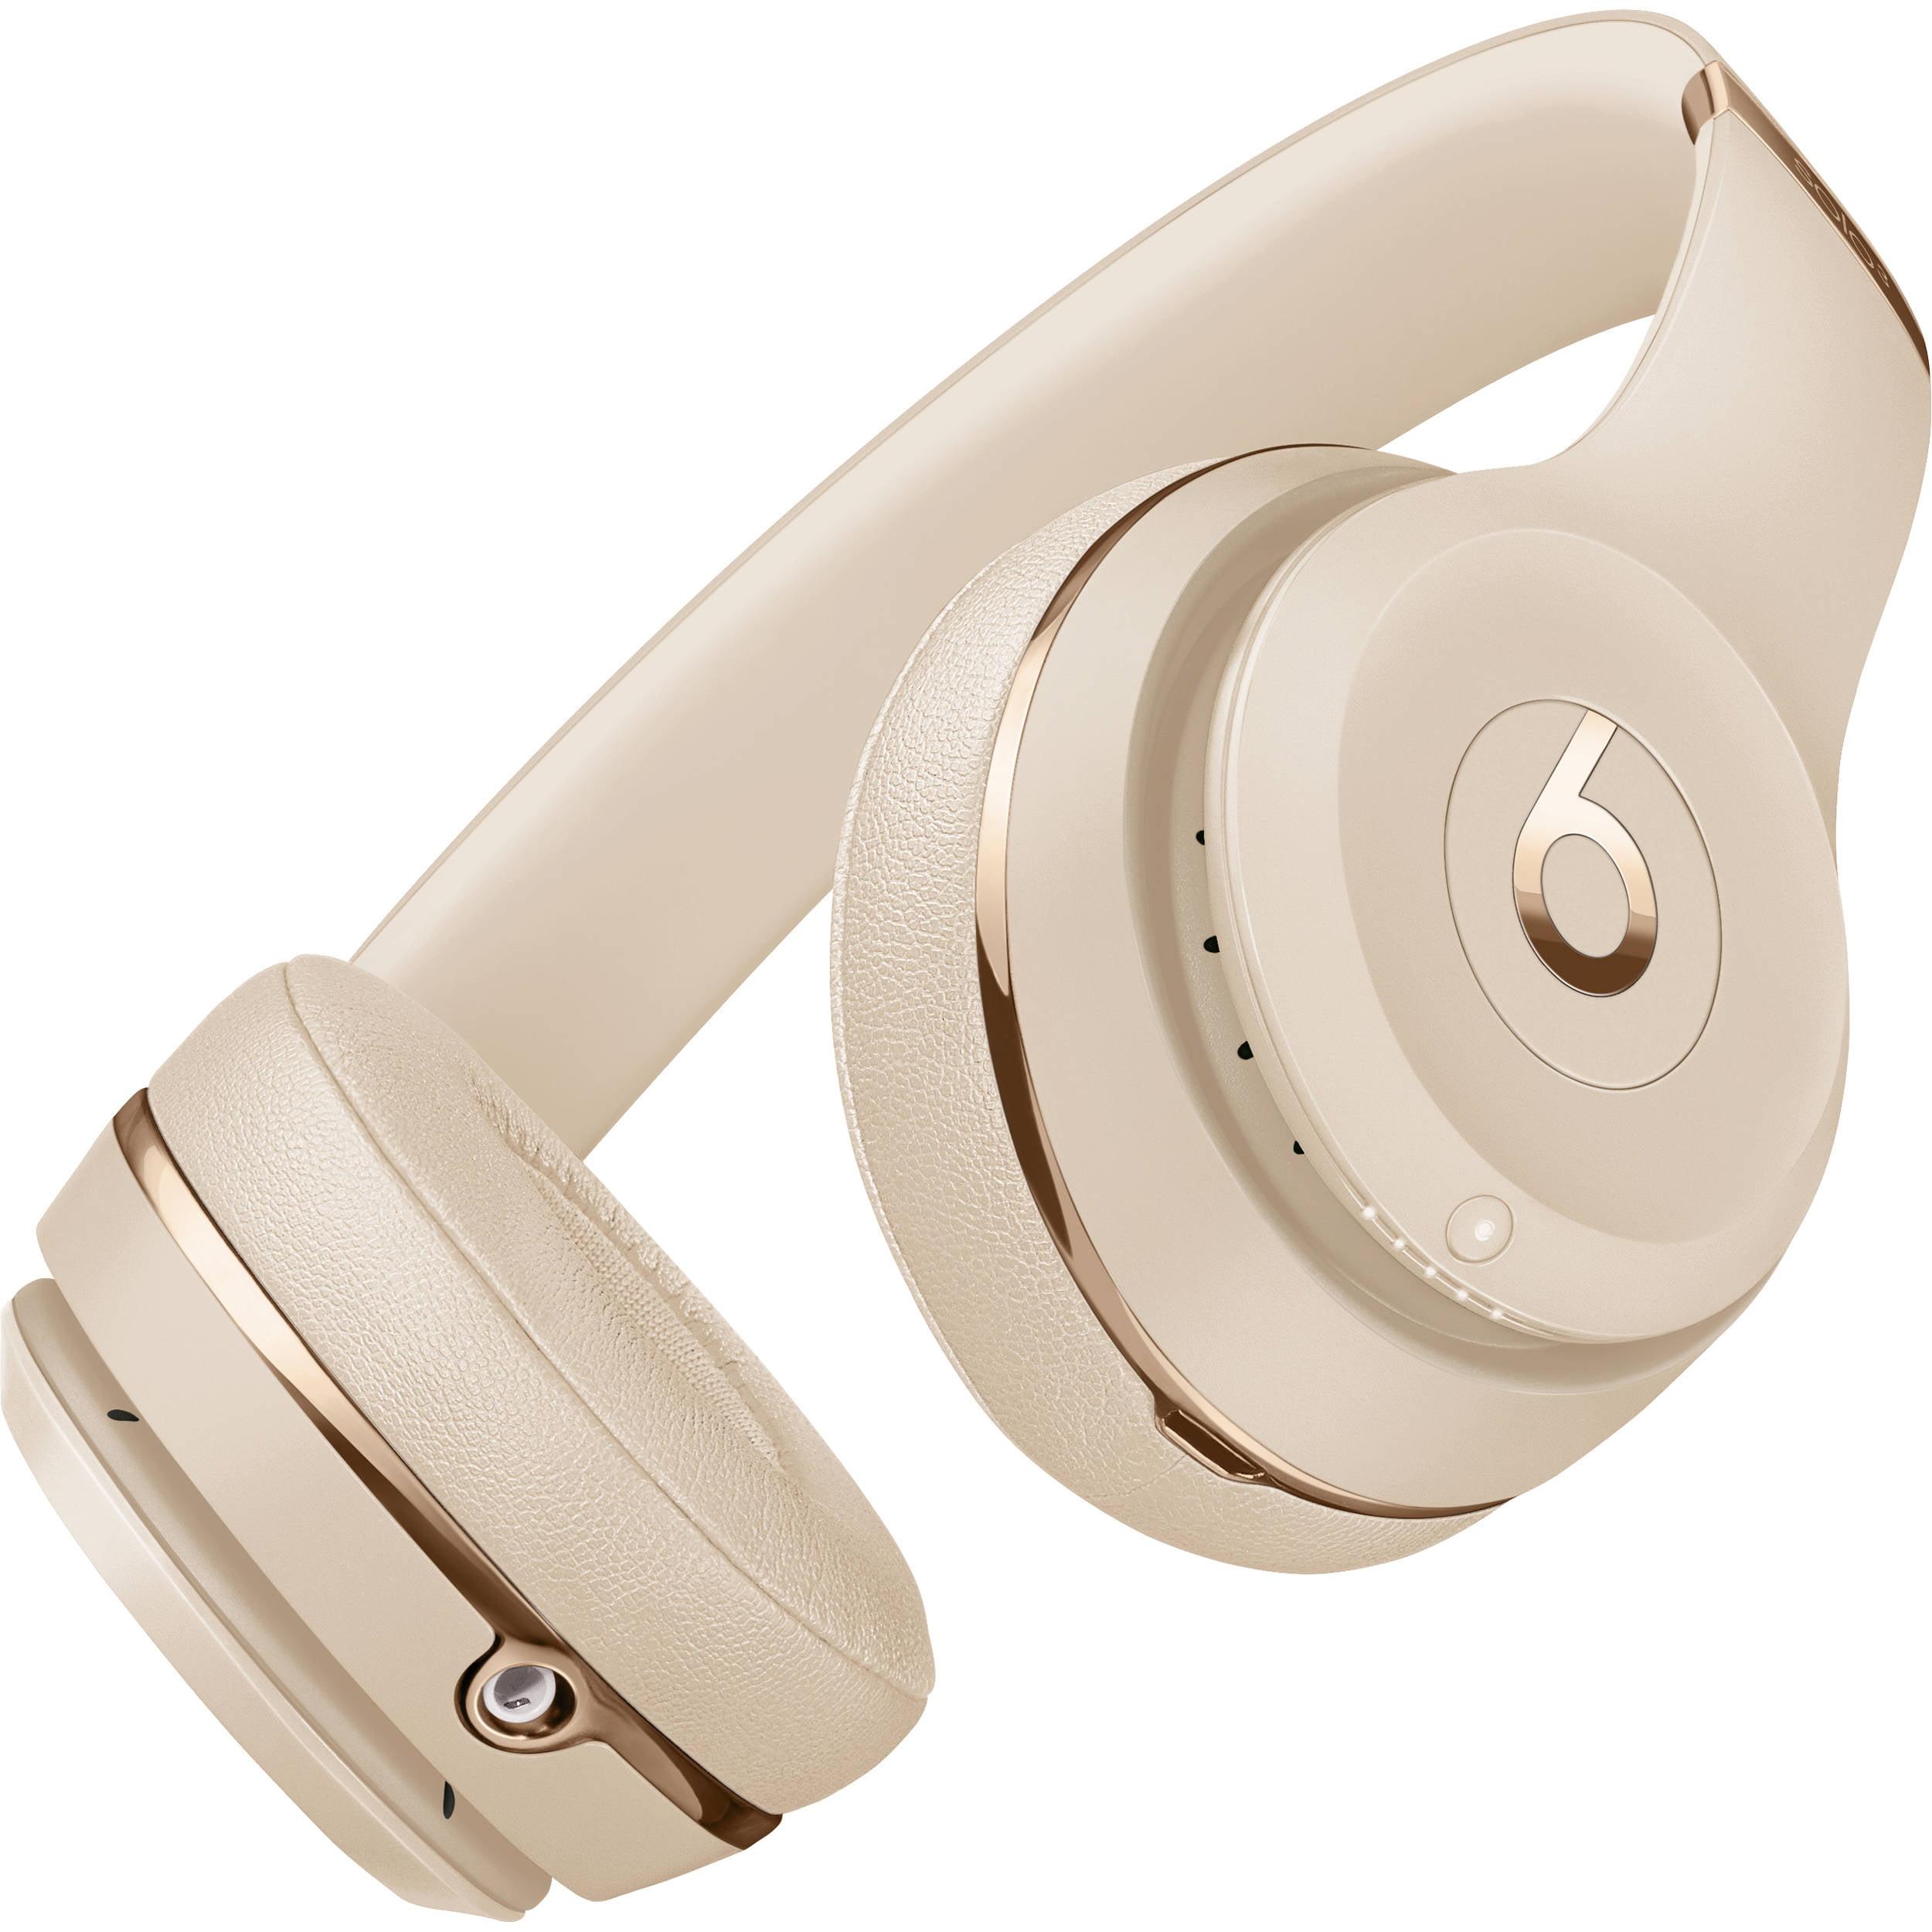 Beats Solo3 Wireless Headphones Satin Gold Walmart Com Walmart Com